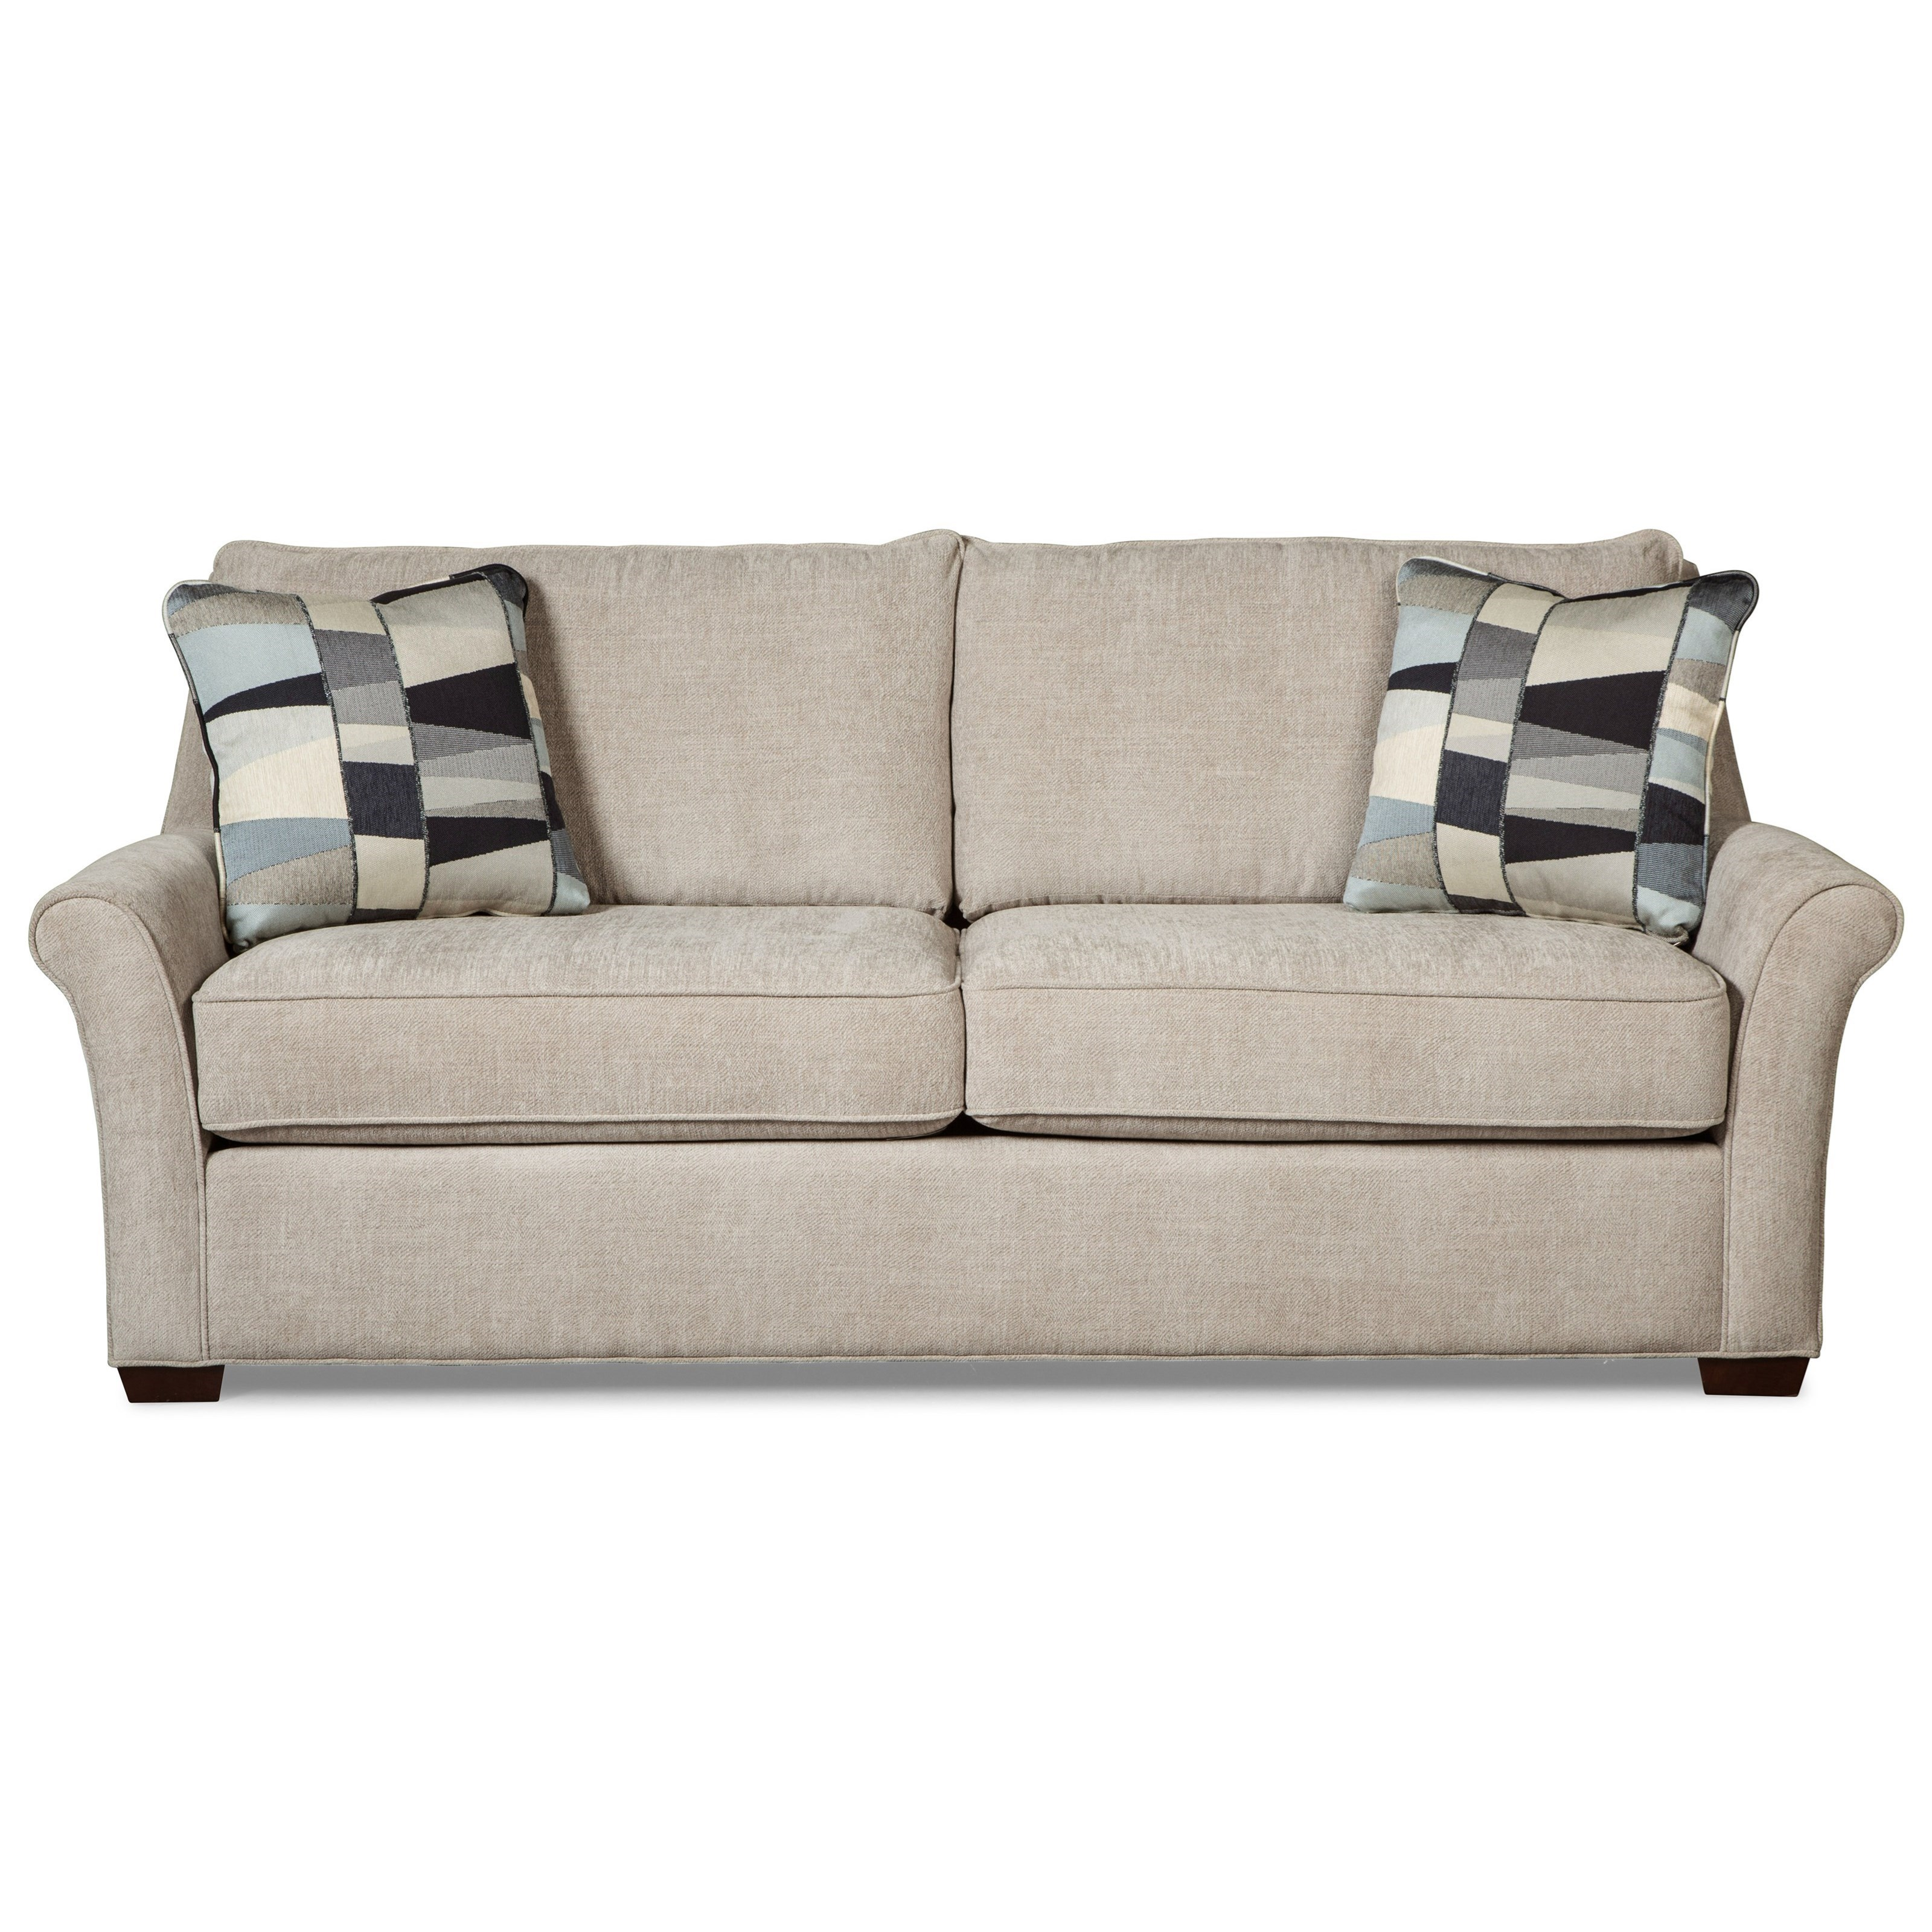 Craftmaster 7686Queen Sleeper Sofa W/ Memory Foam Mattress ...